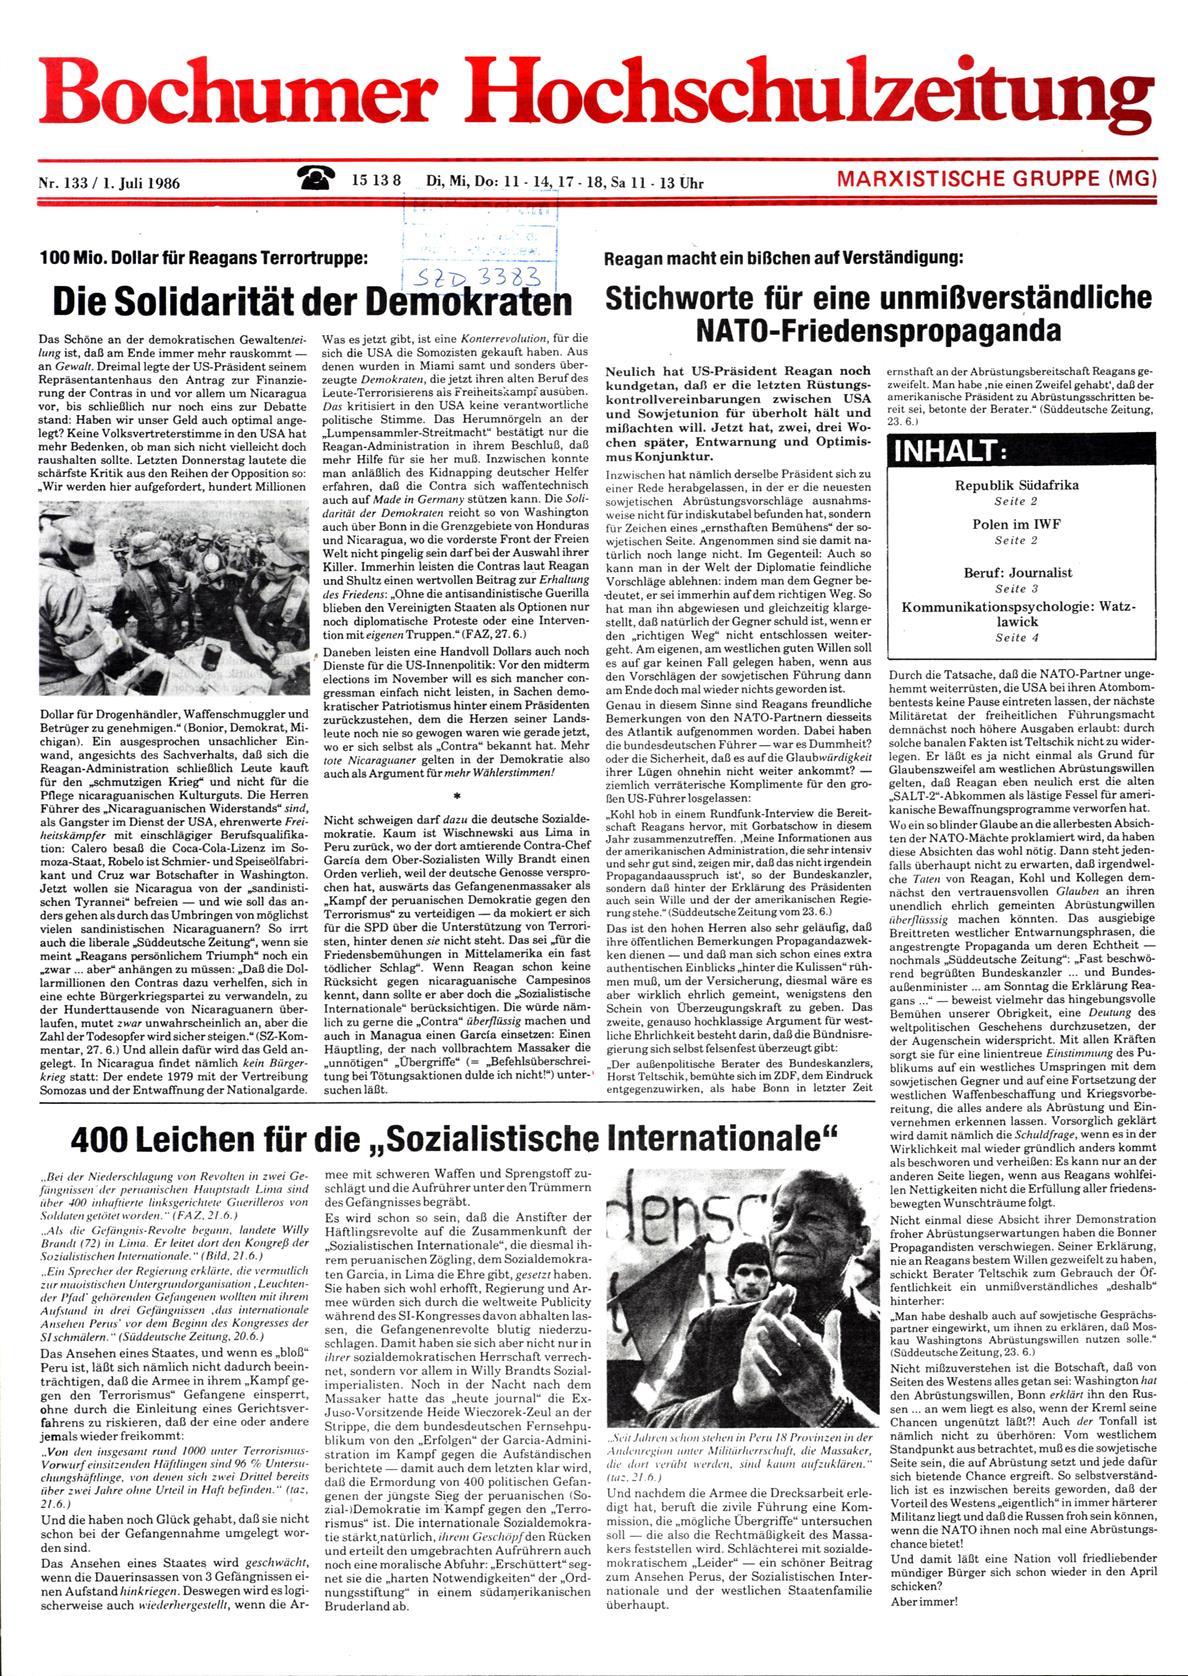 Bochum_BHZ_19860701_133_001